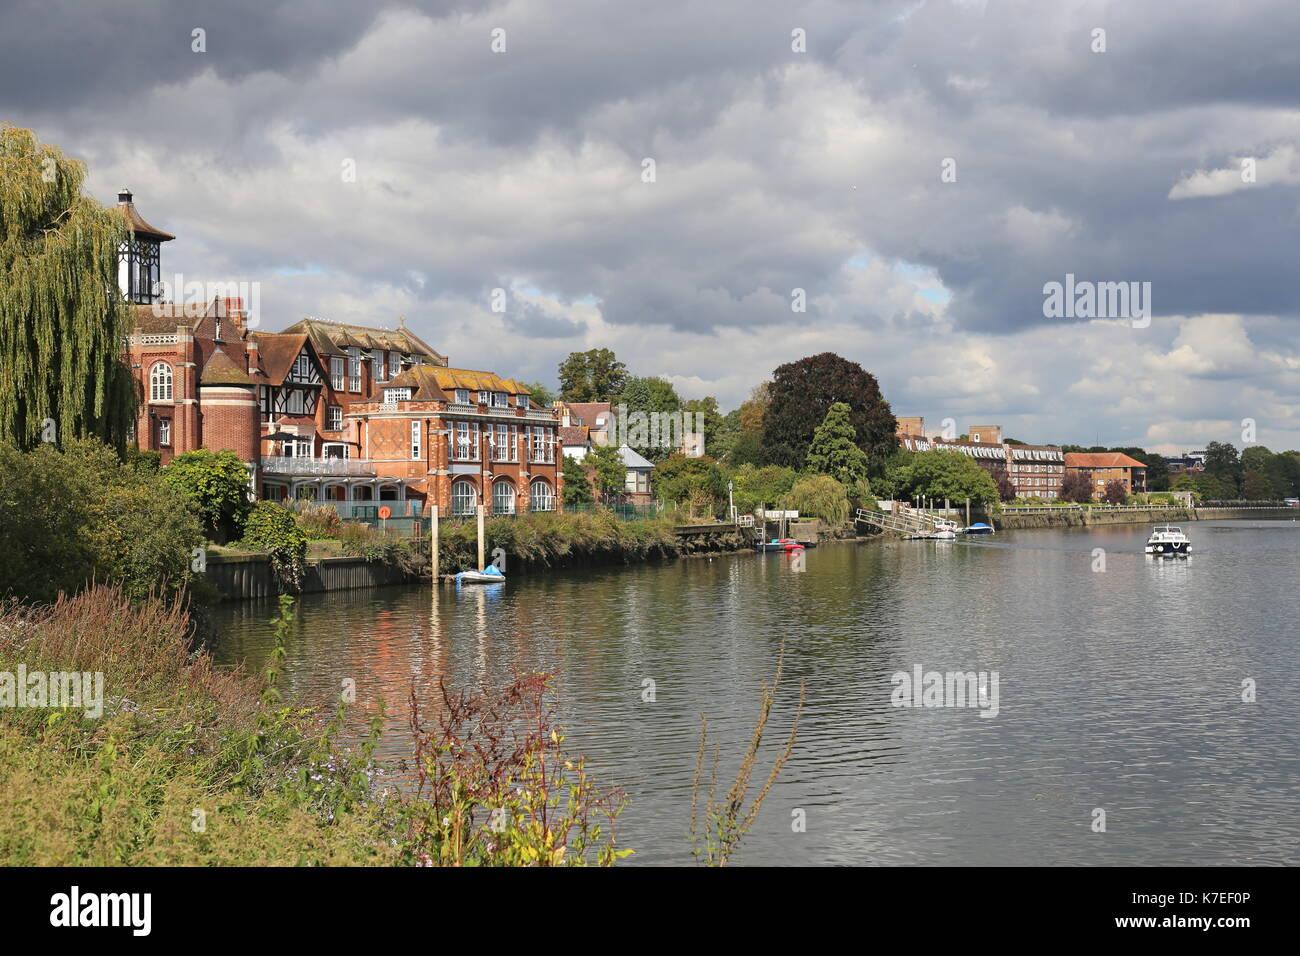 Radnor House School and Thames from Radnor Gardens, Twickenham, London Borough of Richmond upon Thames, England, Great Britain, United Kingdom, Europe - Stock Image